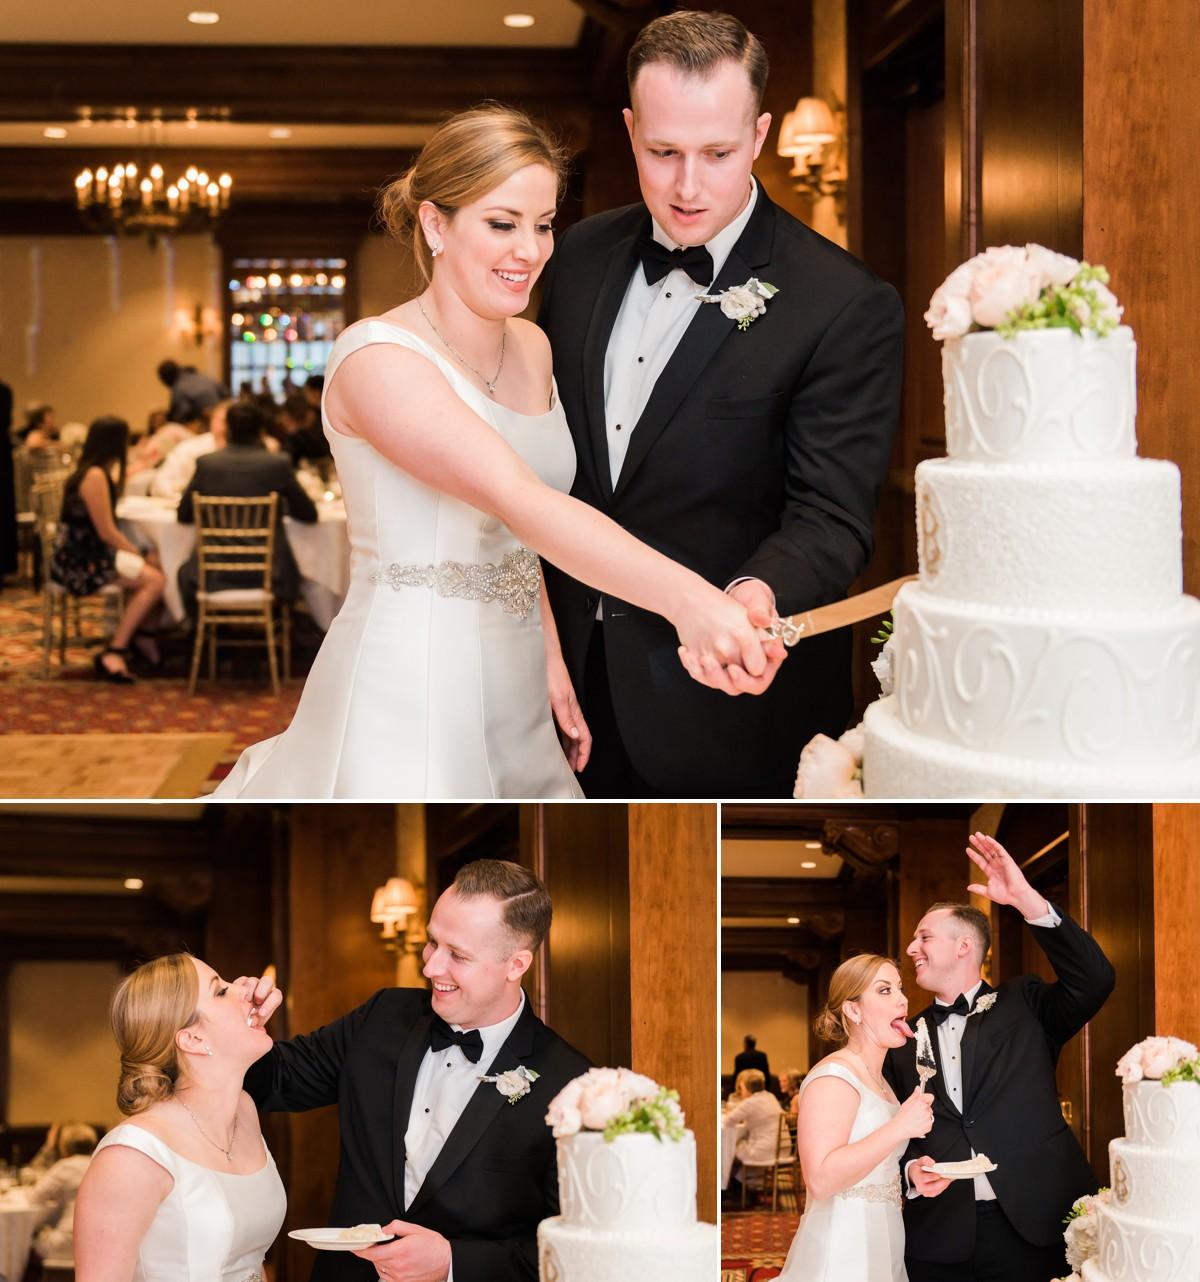 Lauren & Ben Wedding Cake cutting Photo